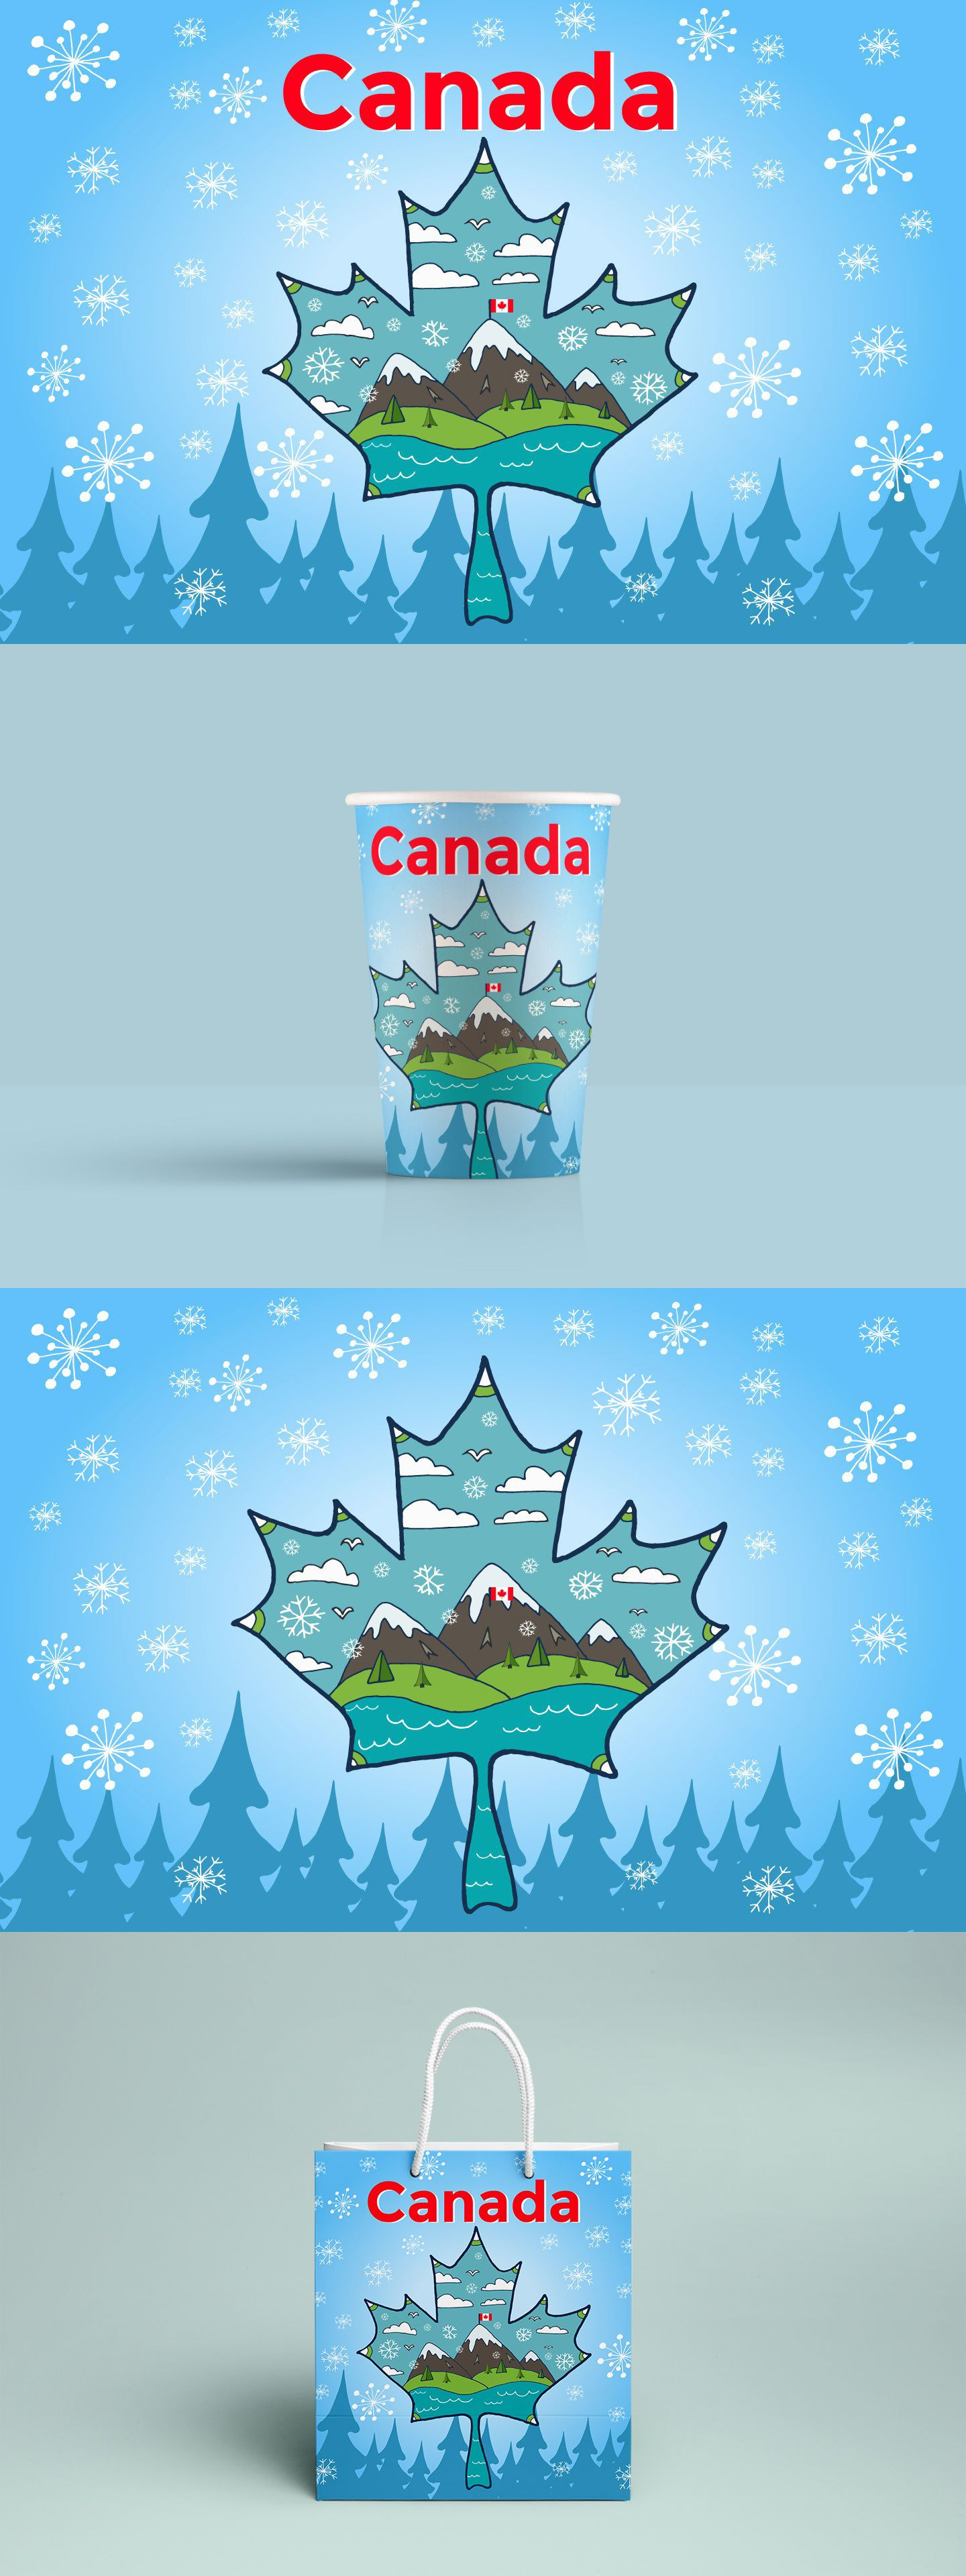 Canada free vector illustration vector